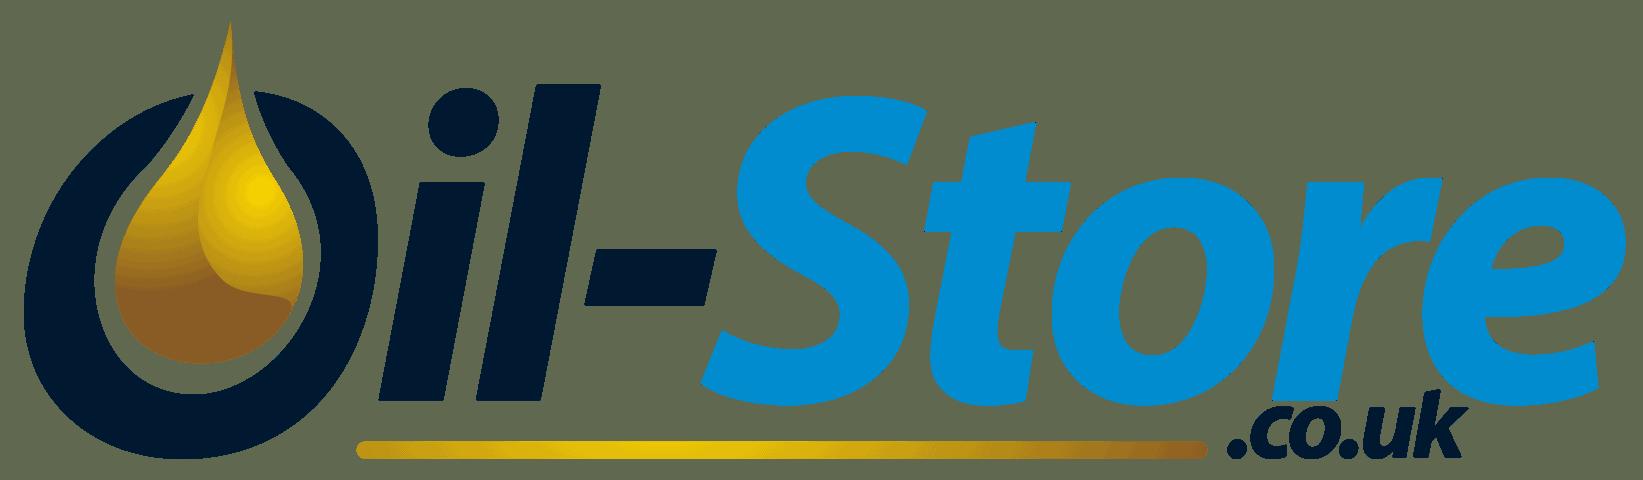 Oil Store